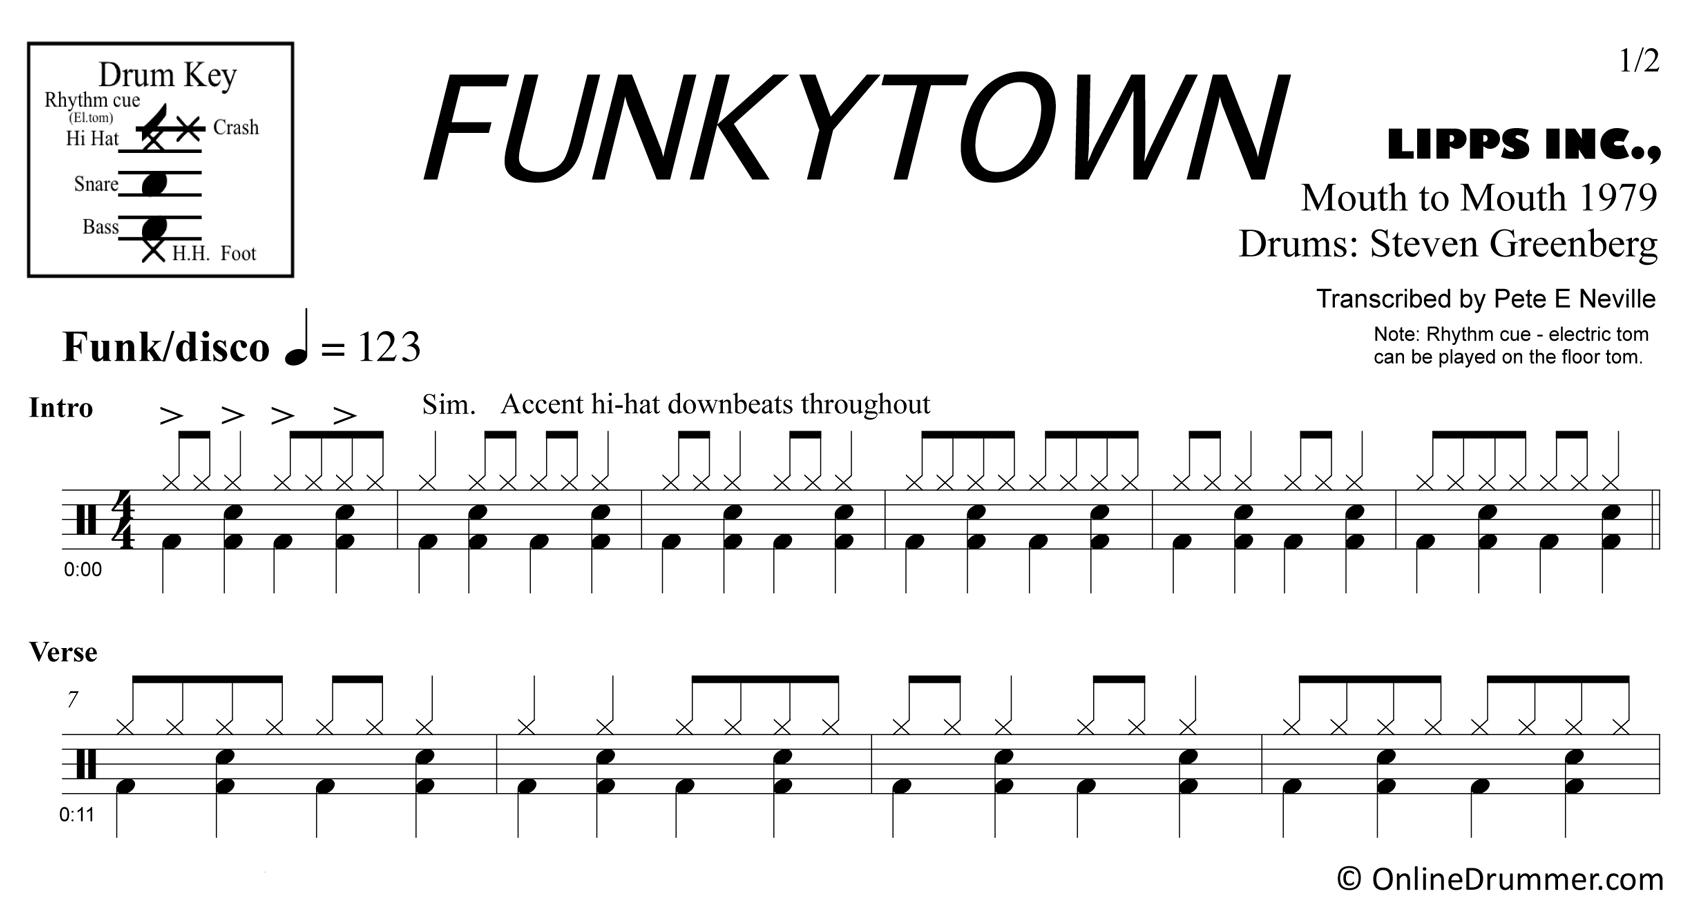 Funkytown - Lipps Inc. - Drum Sheet Music